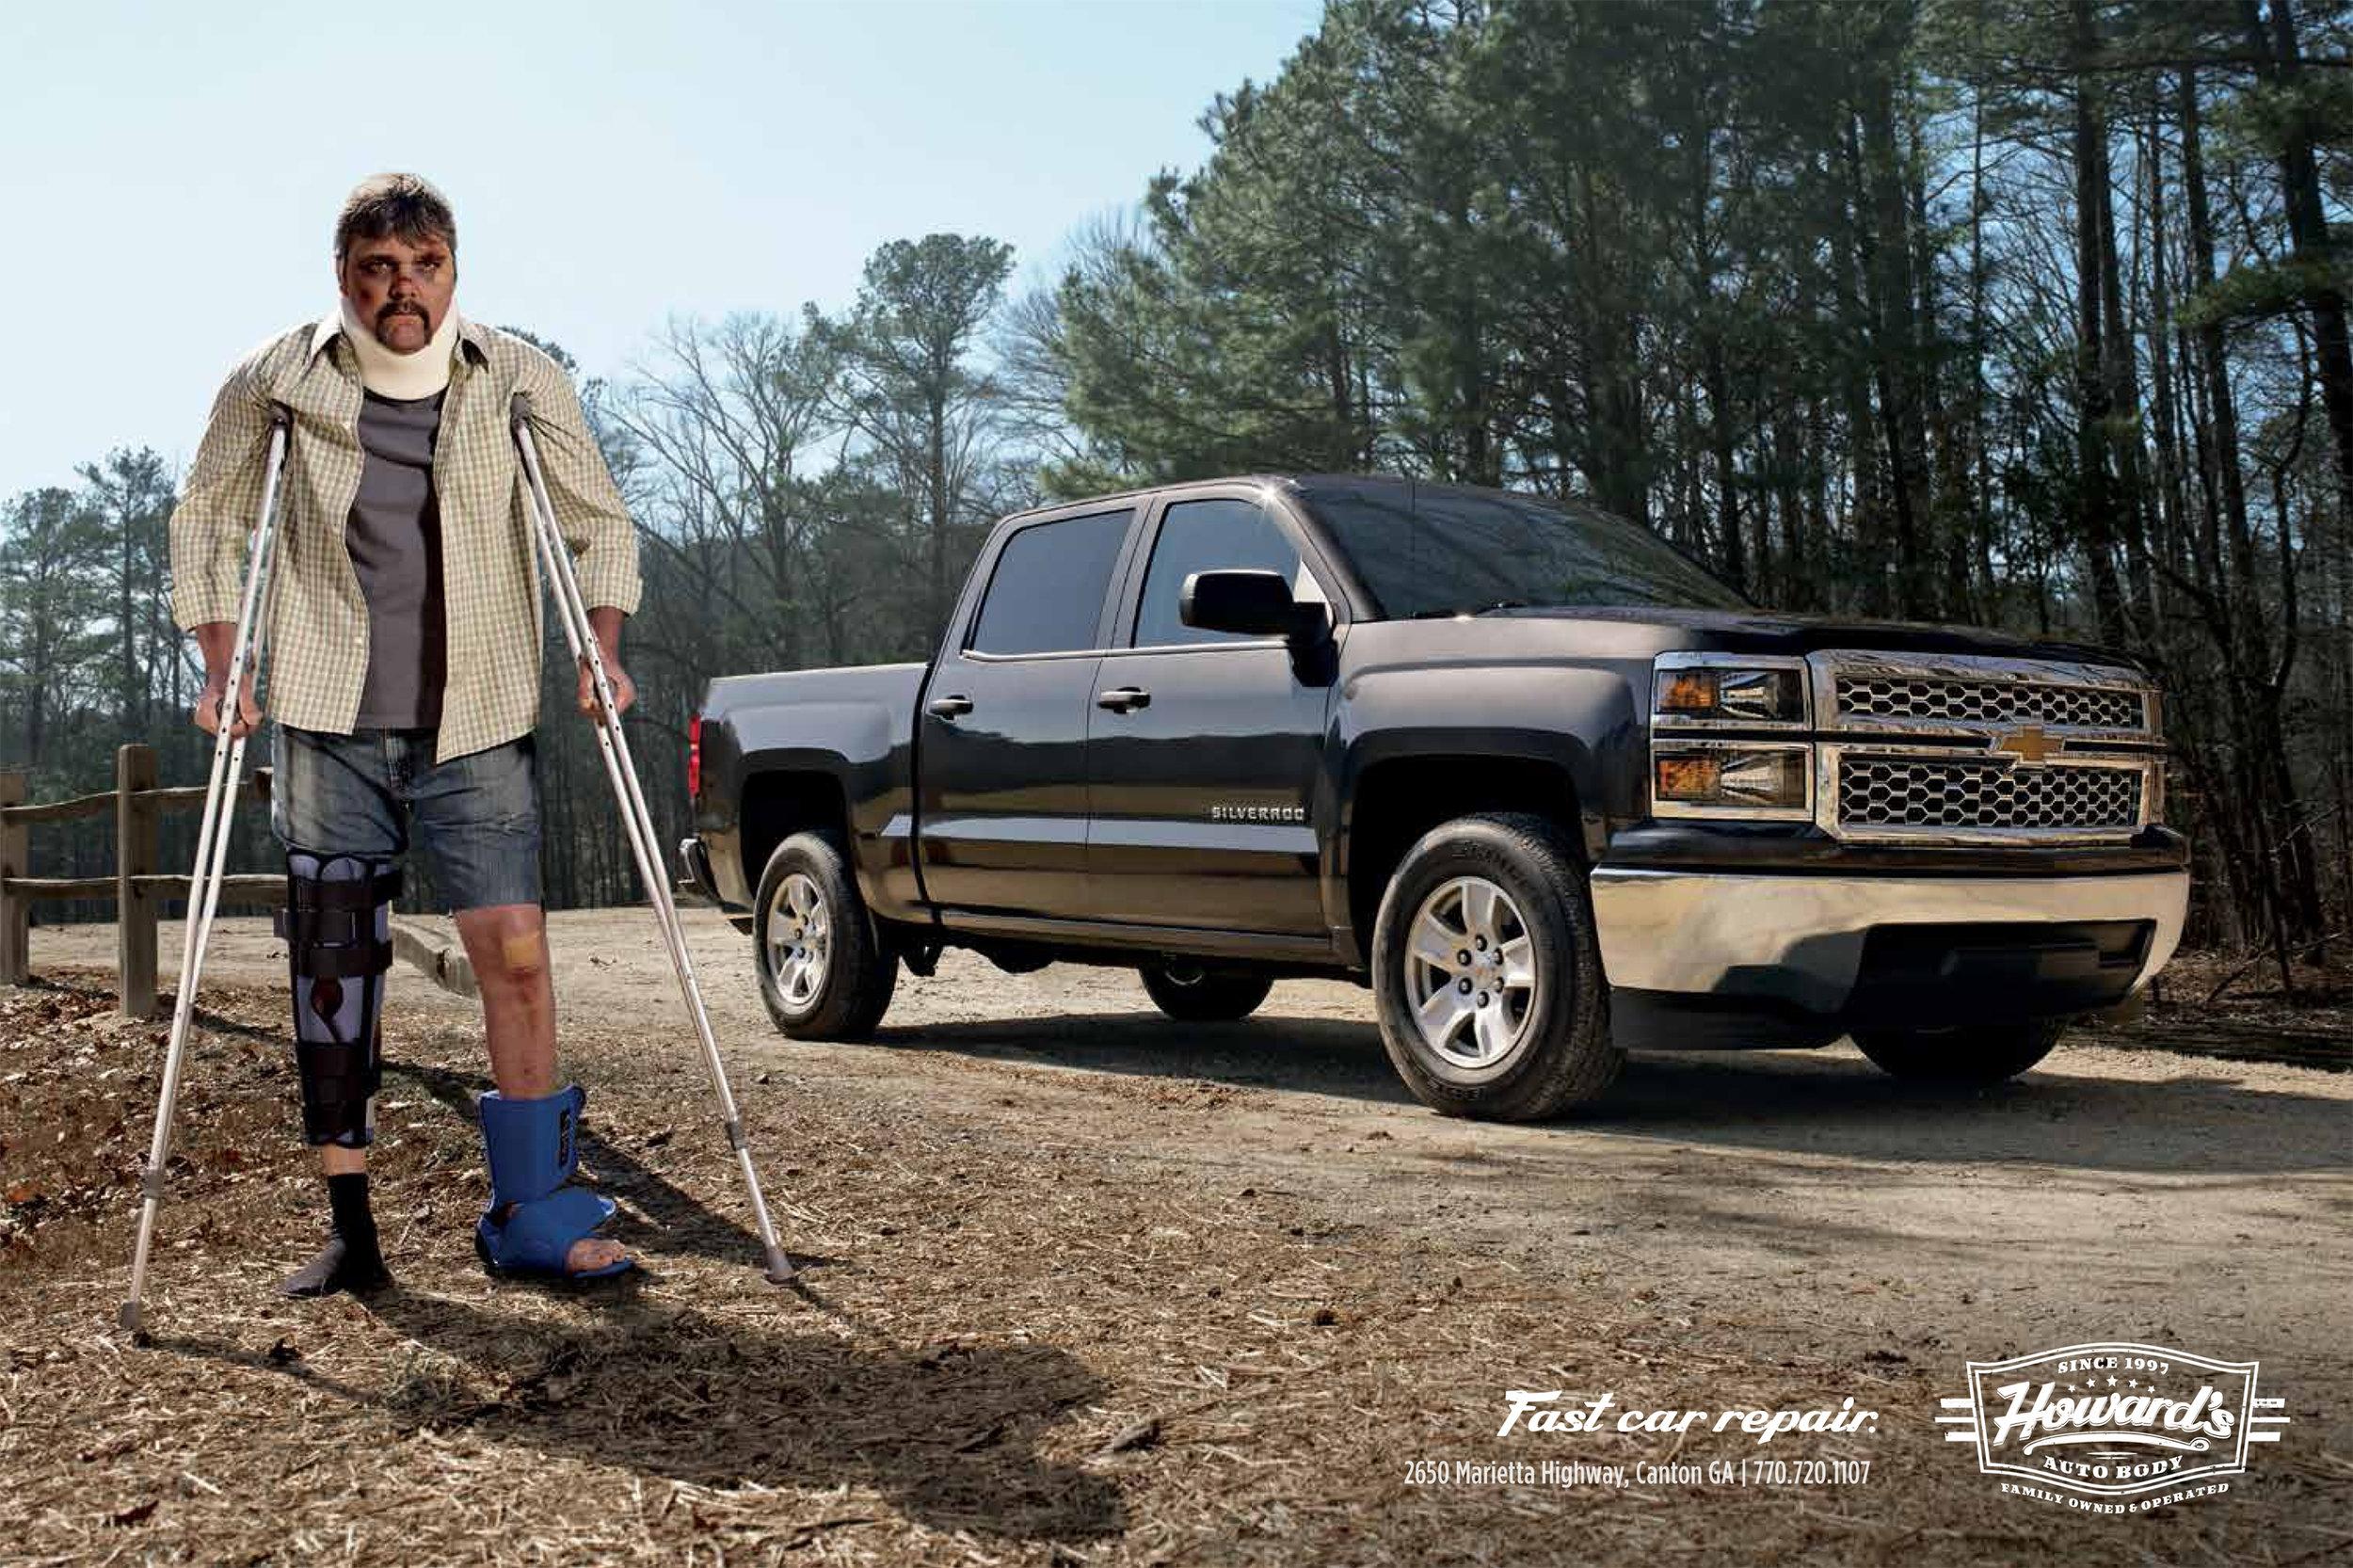 Truck_HowardsAutoBody_Ads_Lg-3.jpg